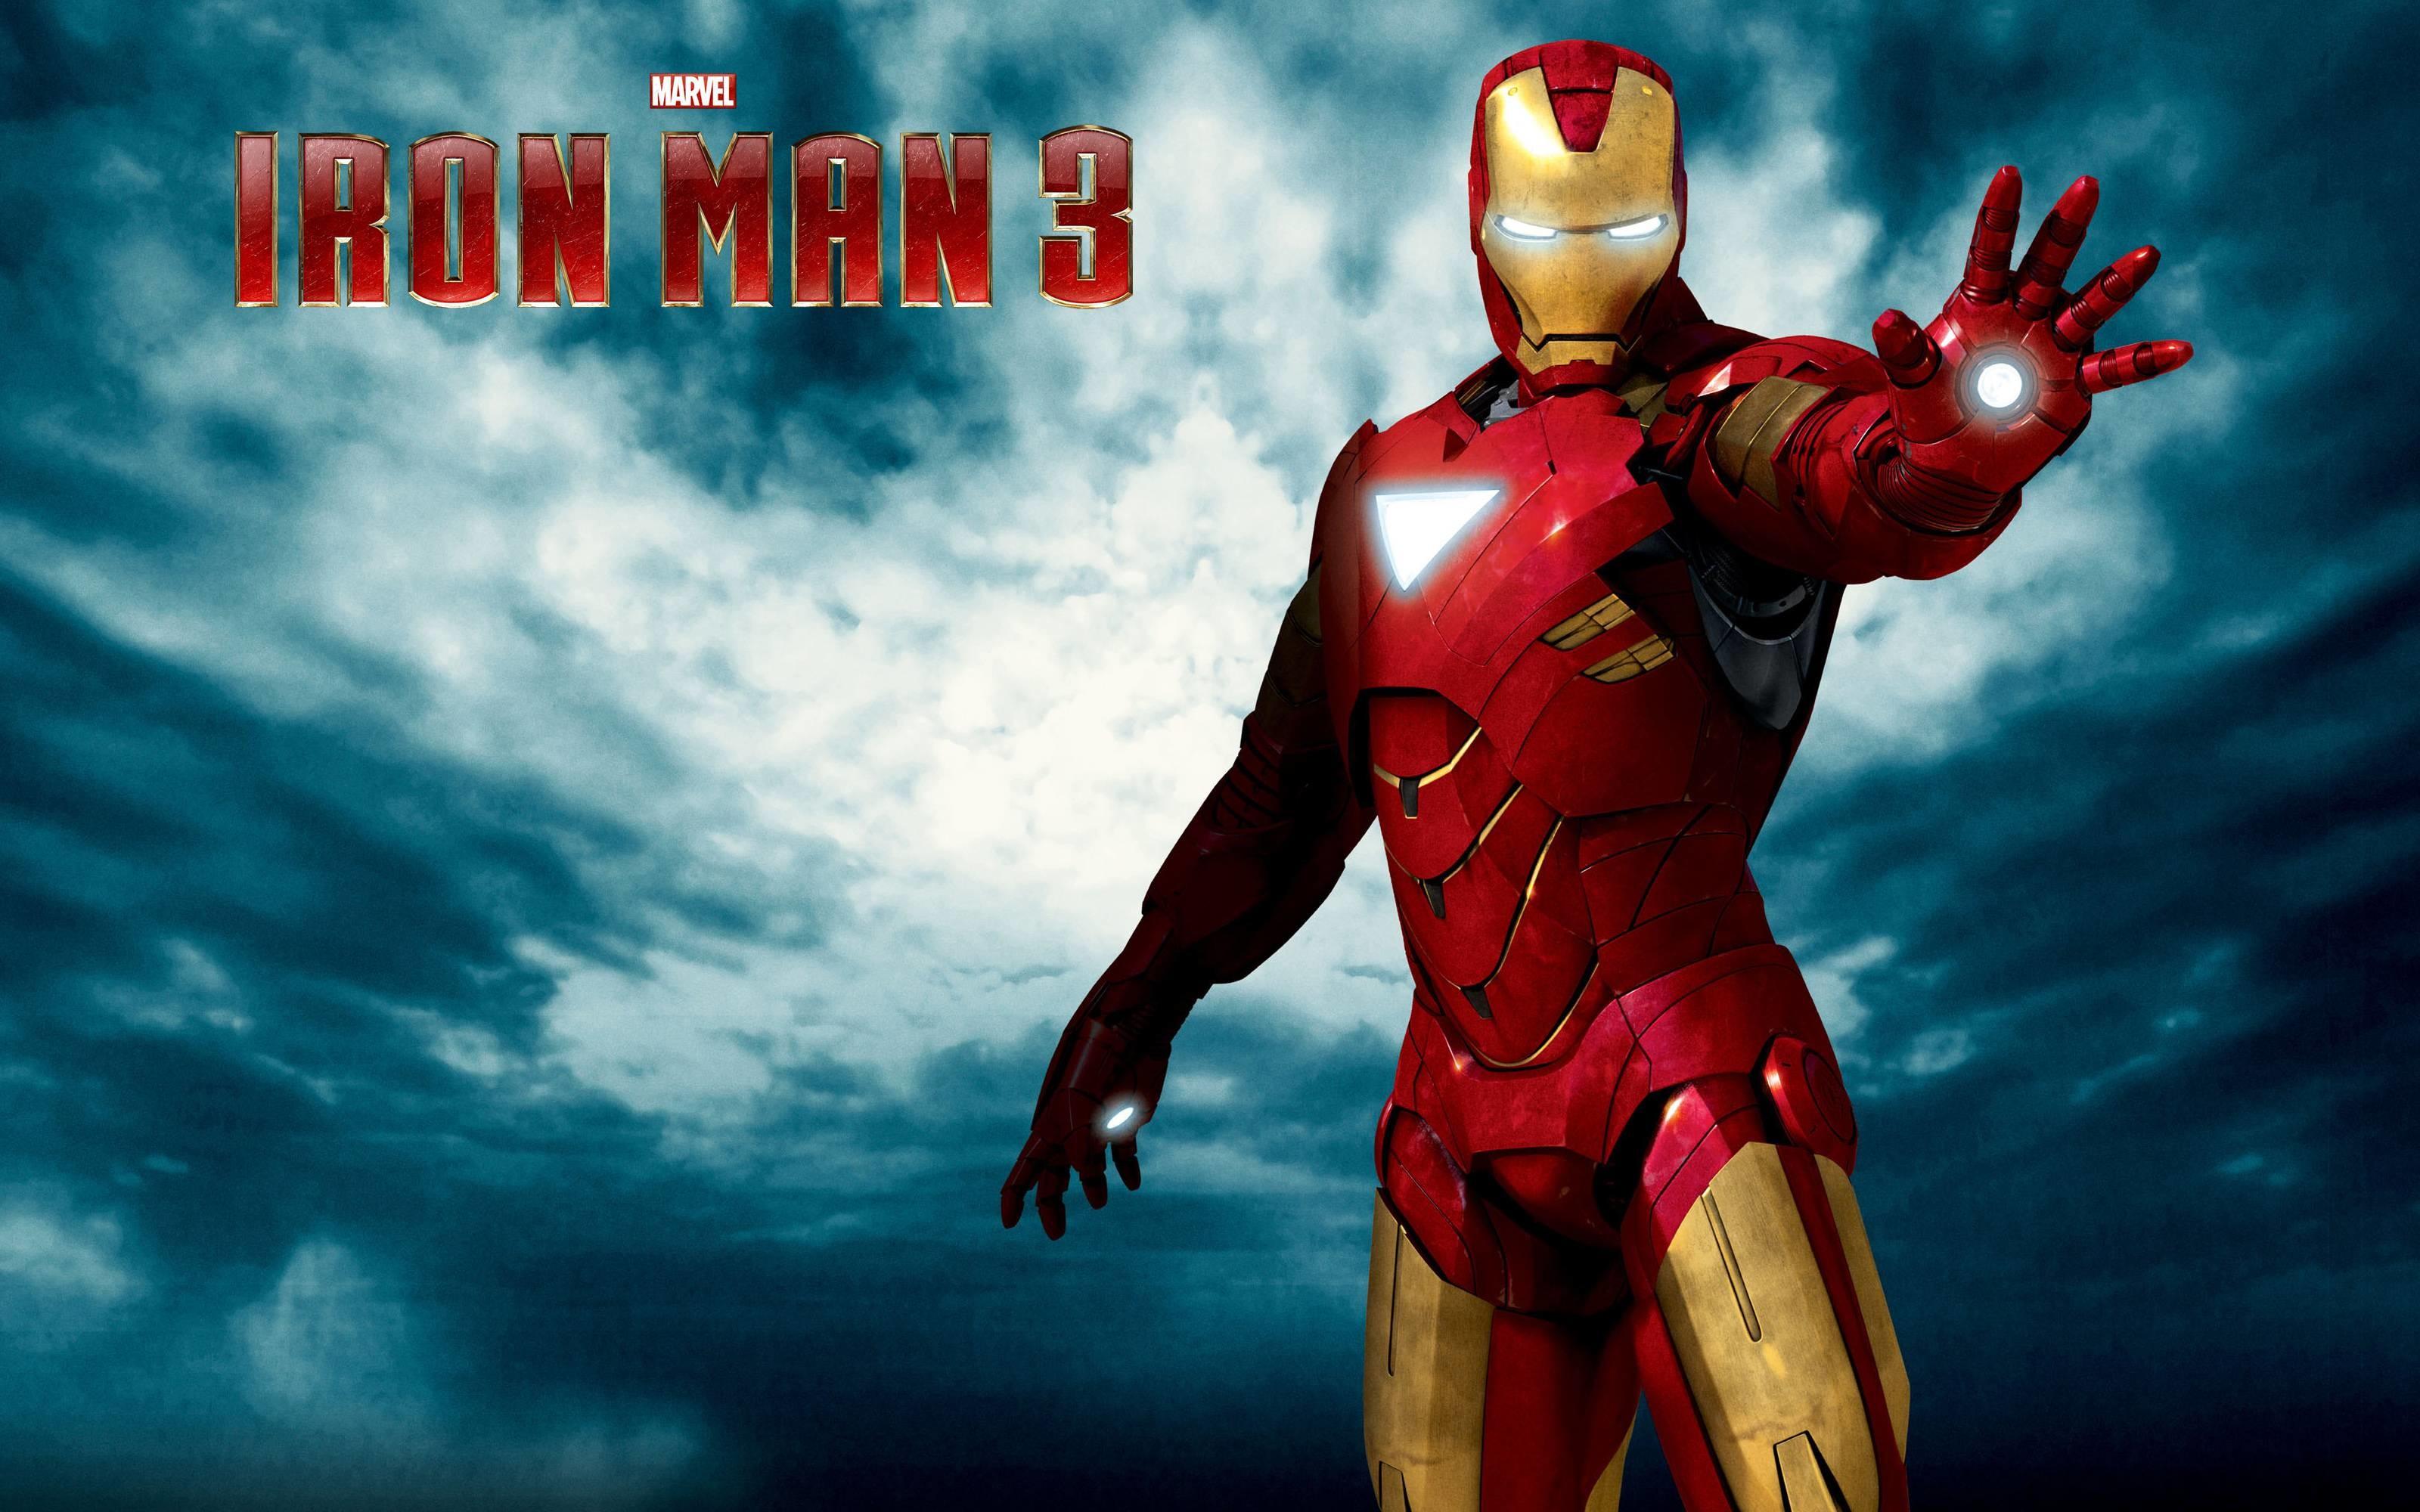 Iron Man 3 HD Wallpapers 1080p